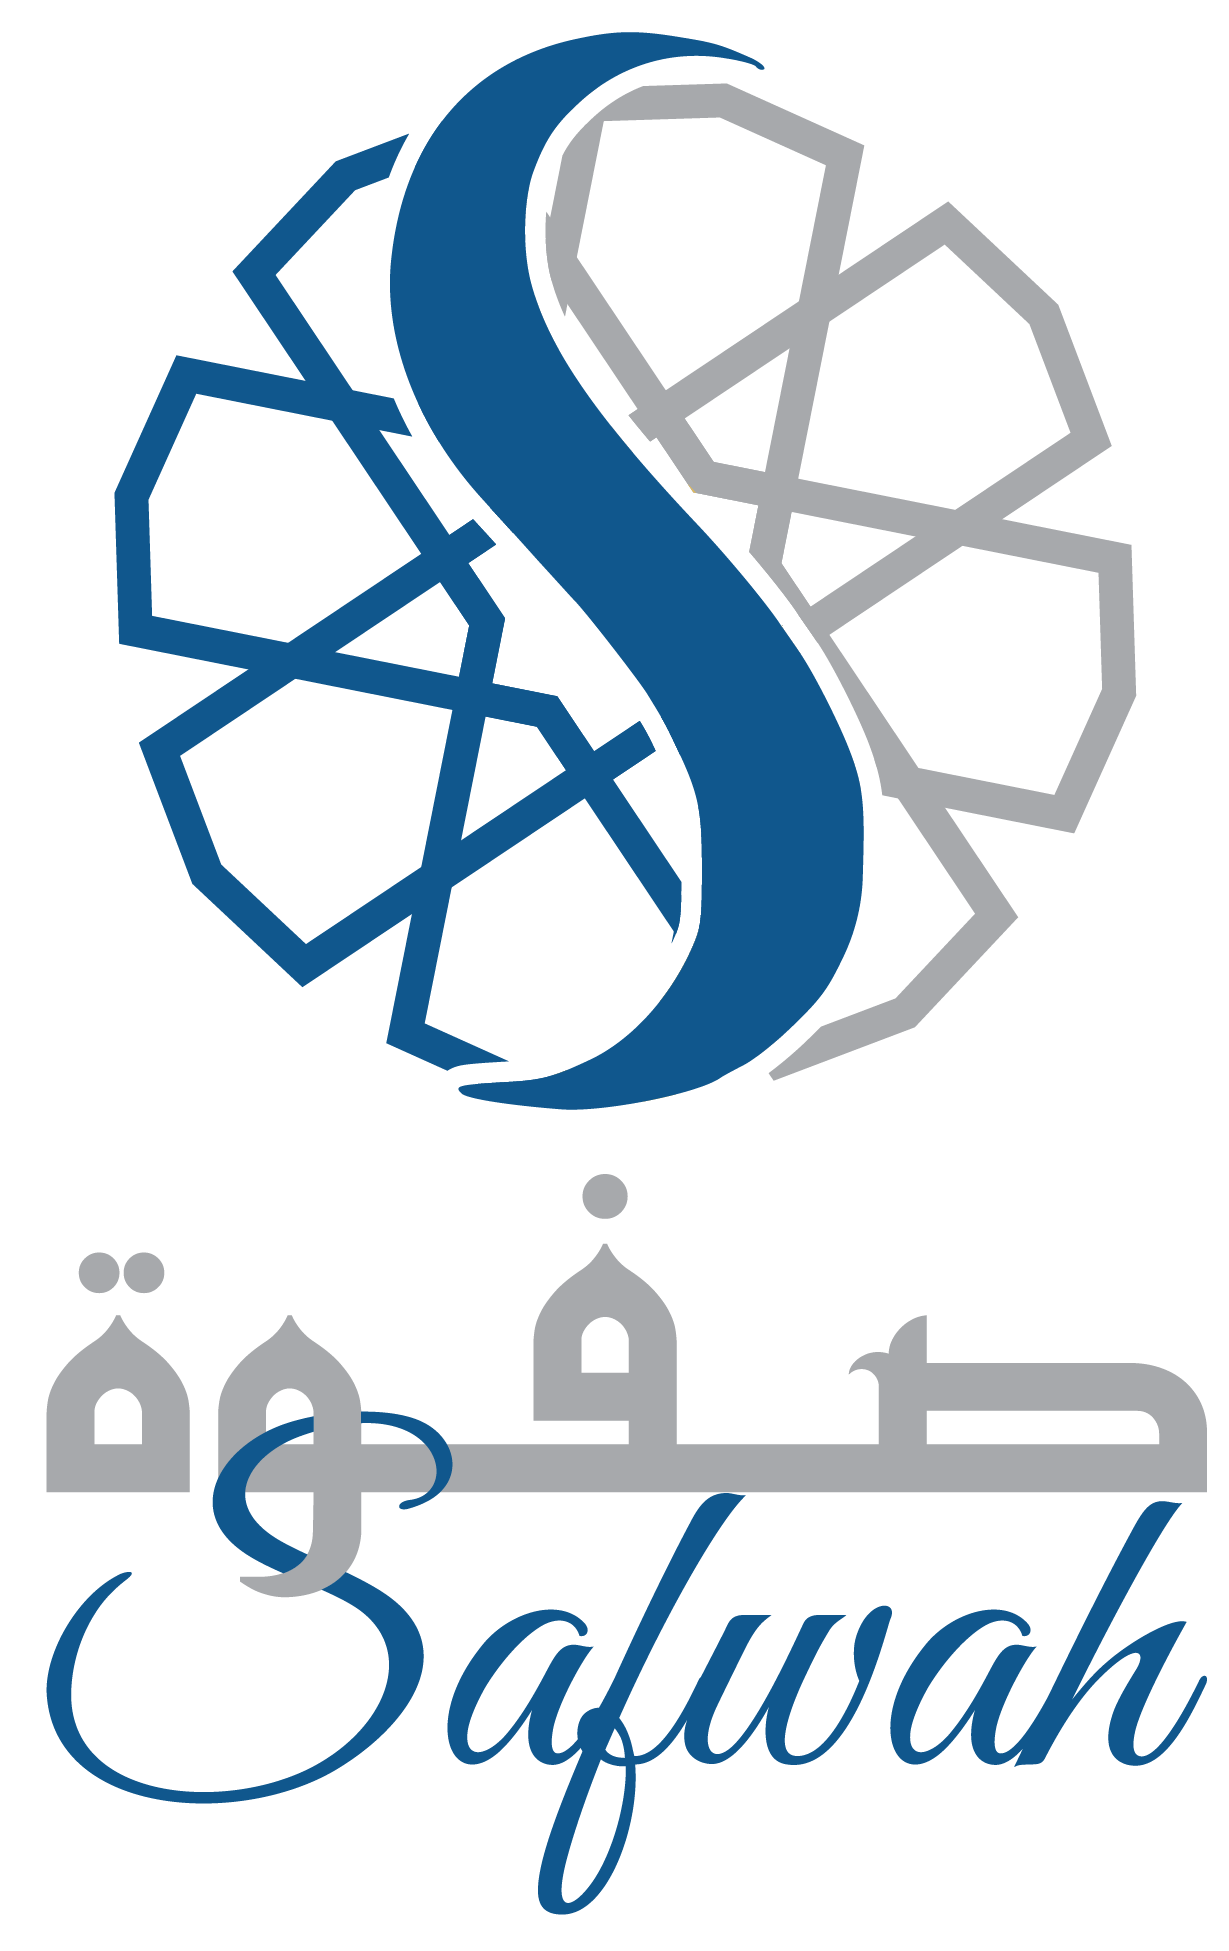 Safwah Online